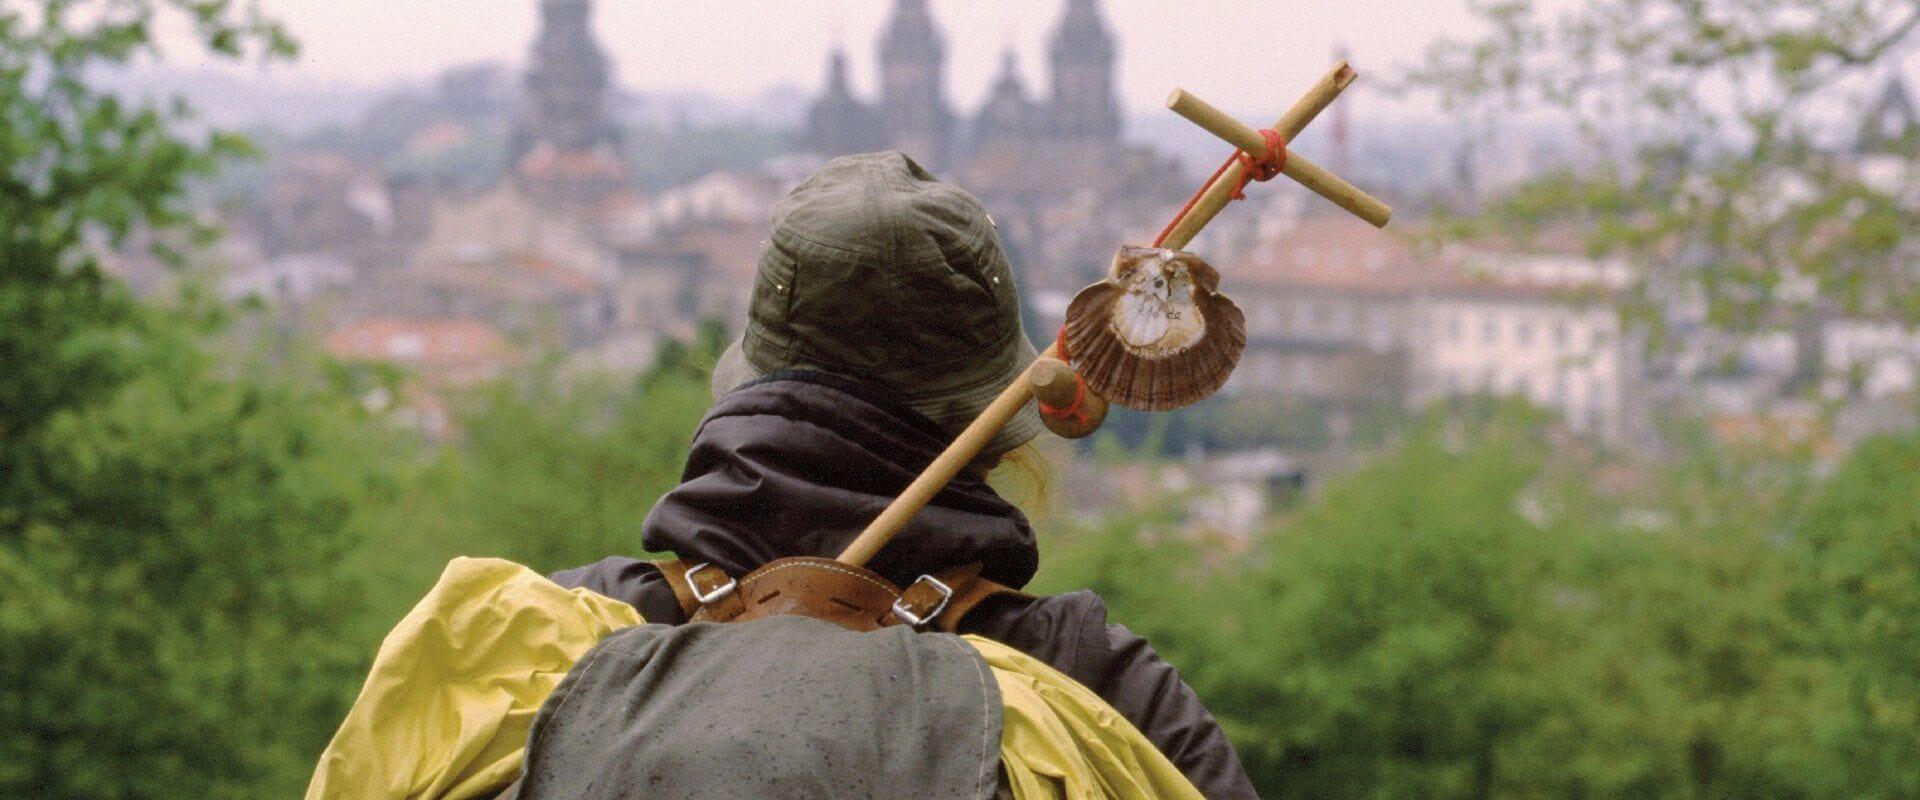 Tours Biblicos Camino de Santiago - Viajes Religiosos